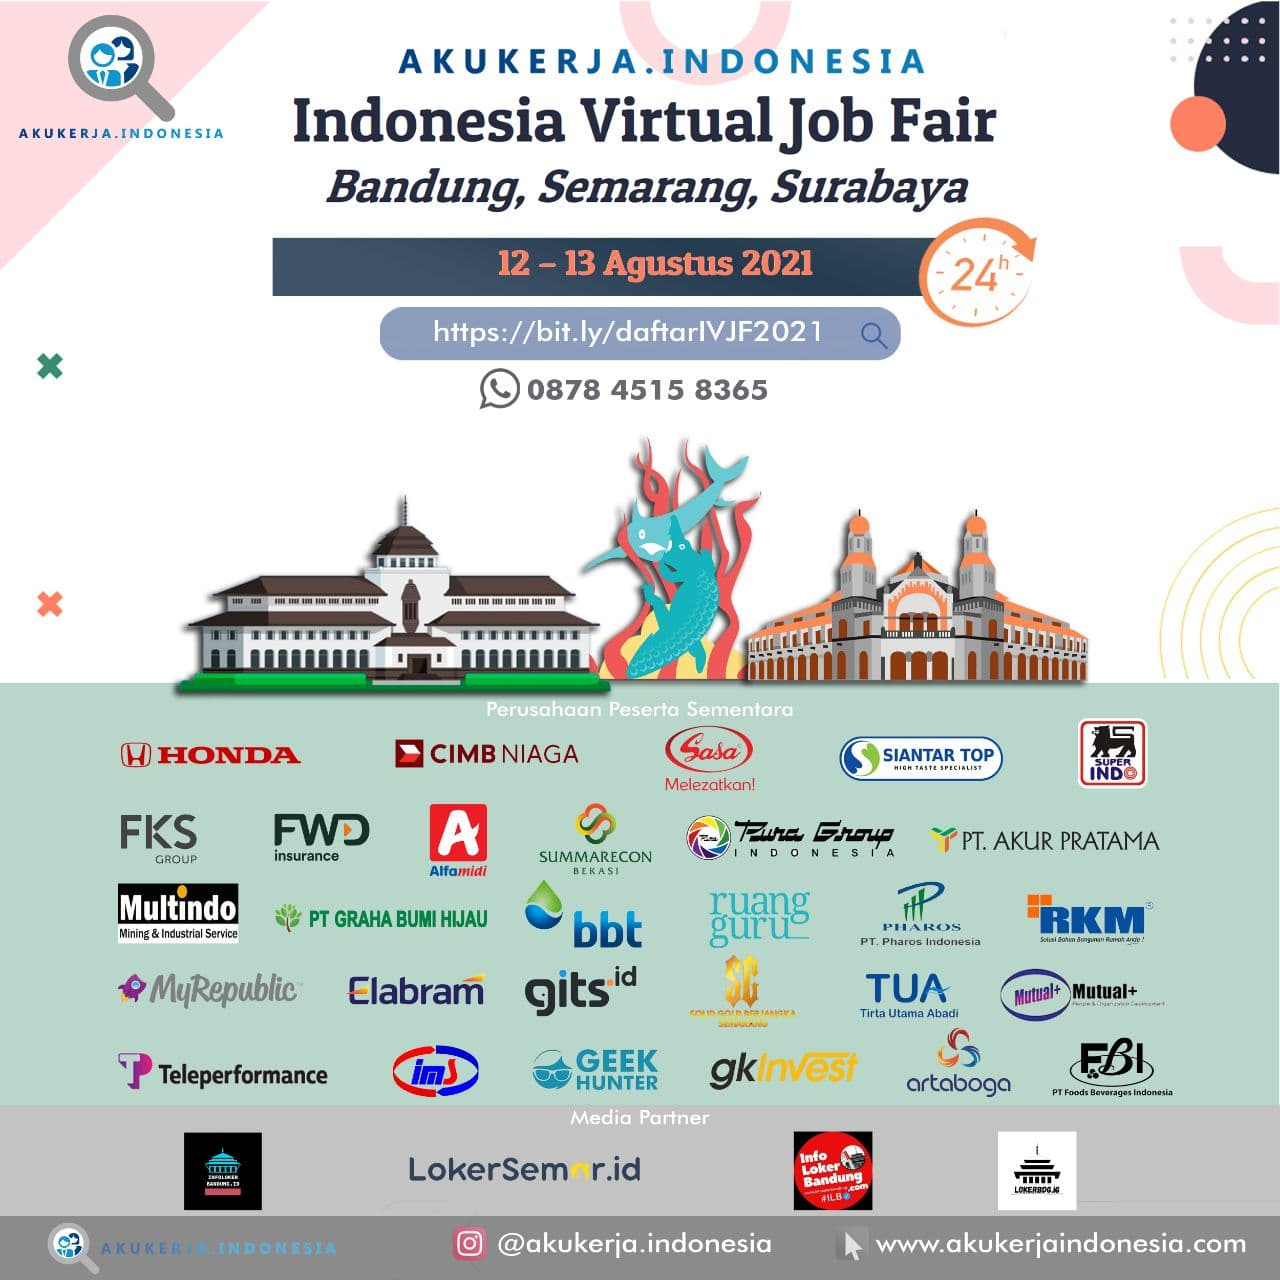 Indonesia Virtual Job Fair Aku Kerja Indonesia 12 - 13 Agustus 2021